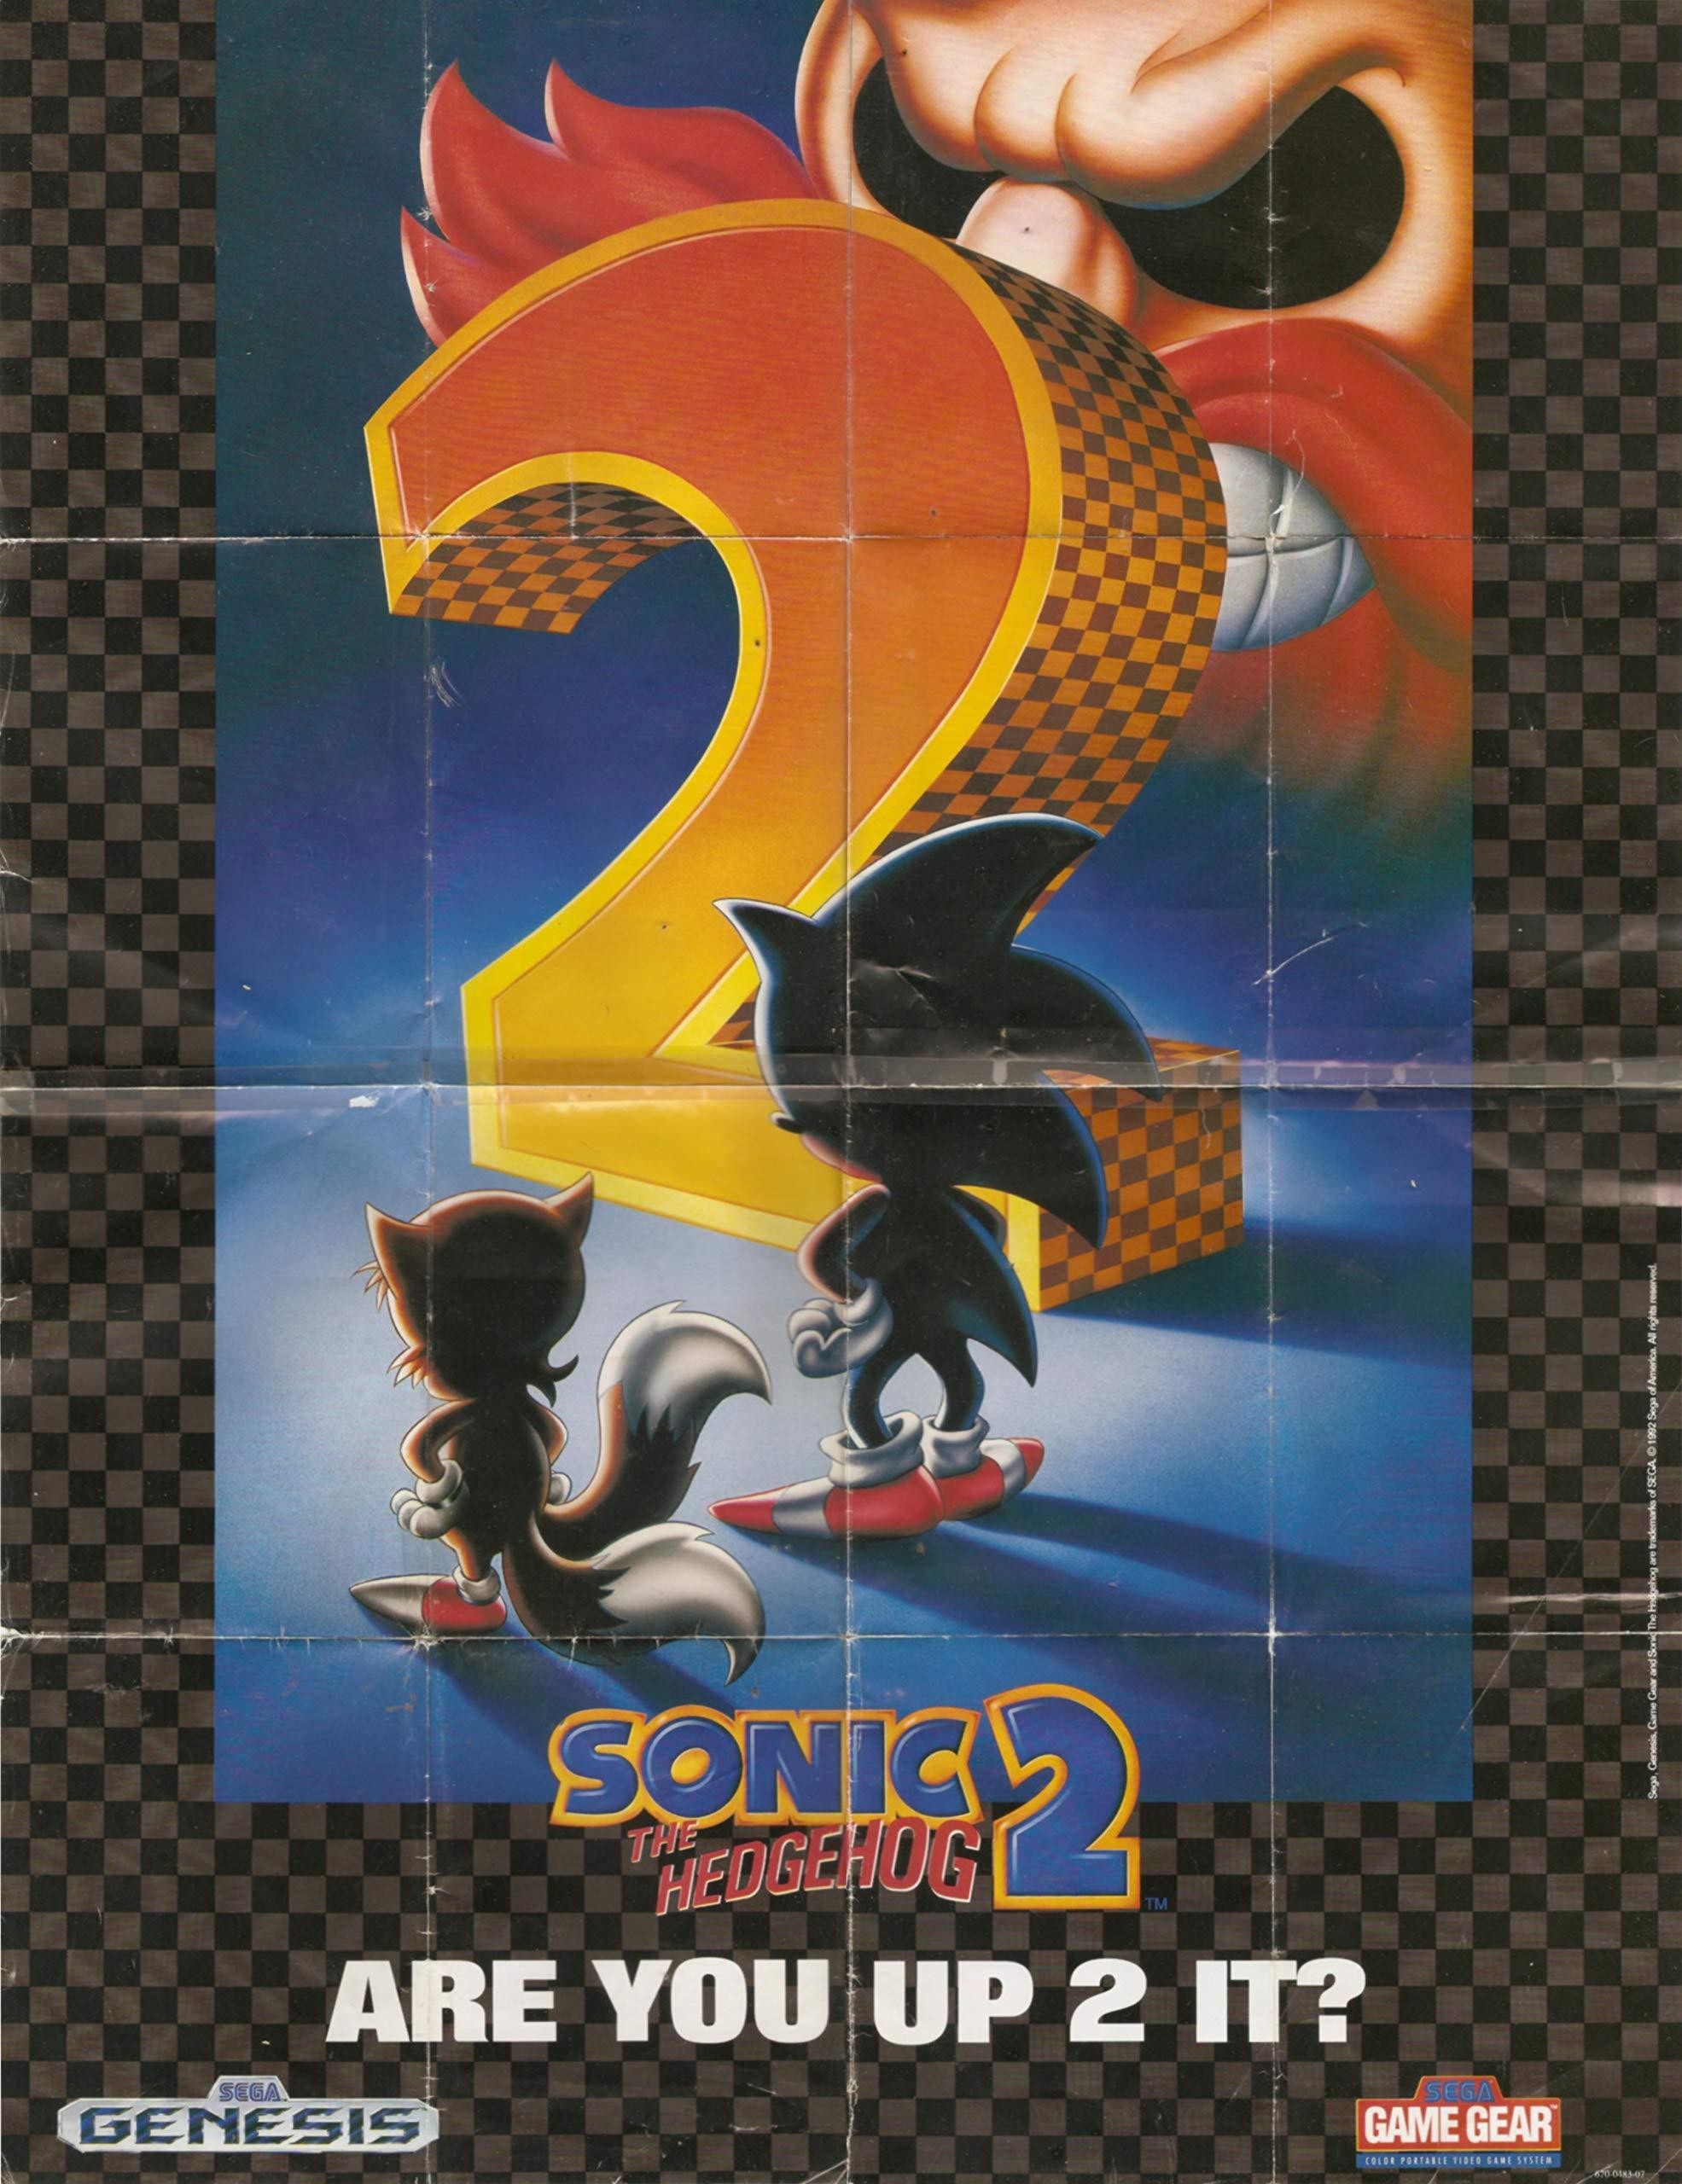 Vintage 1992 Sega Genesis Reversible Sonic The Hedgehog 2 Are You Up To It Way Ahead Of The Game Insert Poster Batman Returns Sega Amazon Com Books